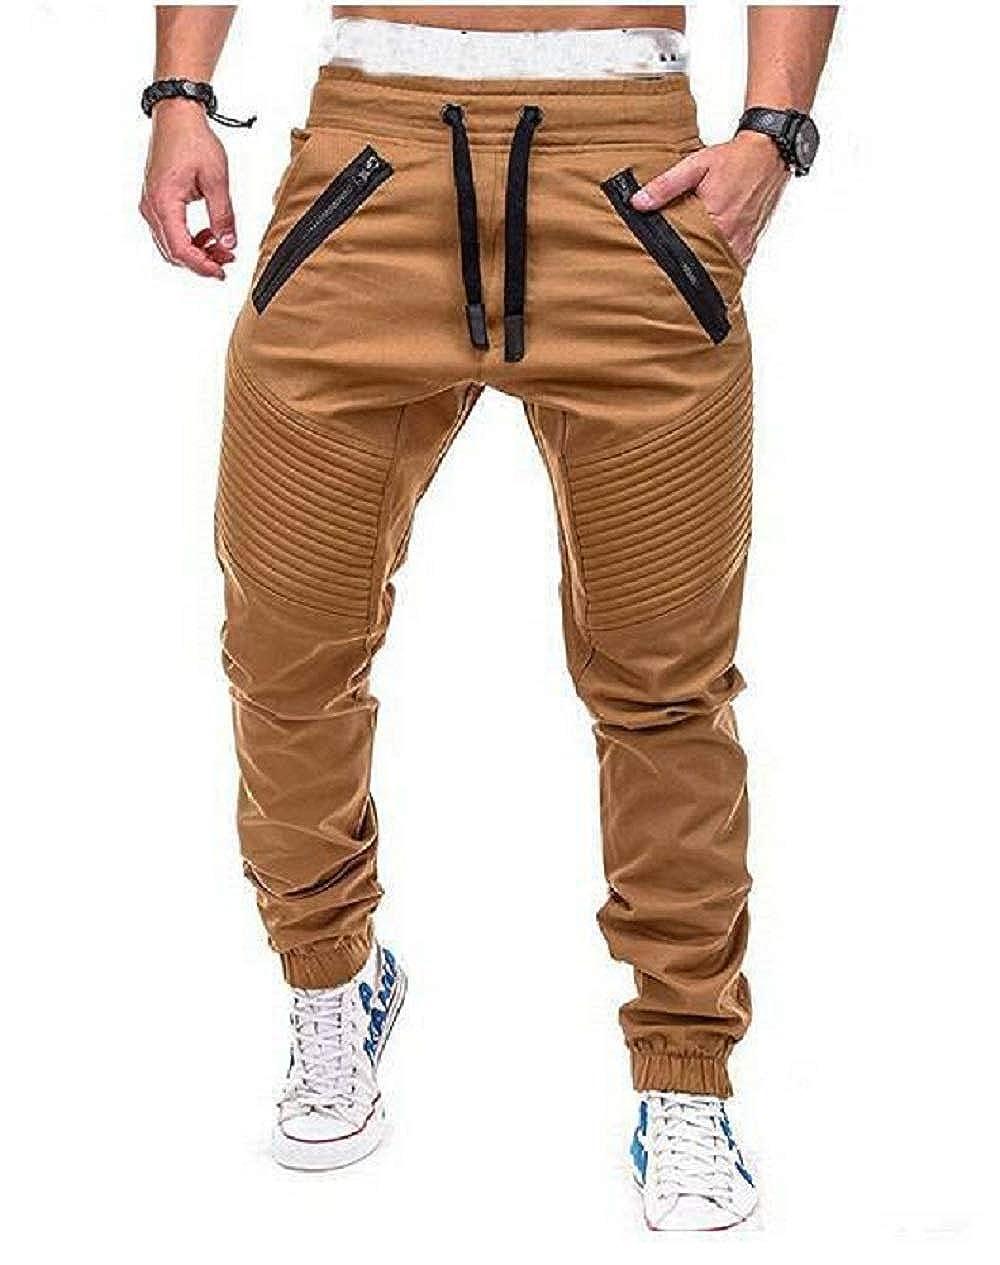 Franhais Mens Stretch Twill Drop Crotch Jogger Pants M-3XL